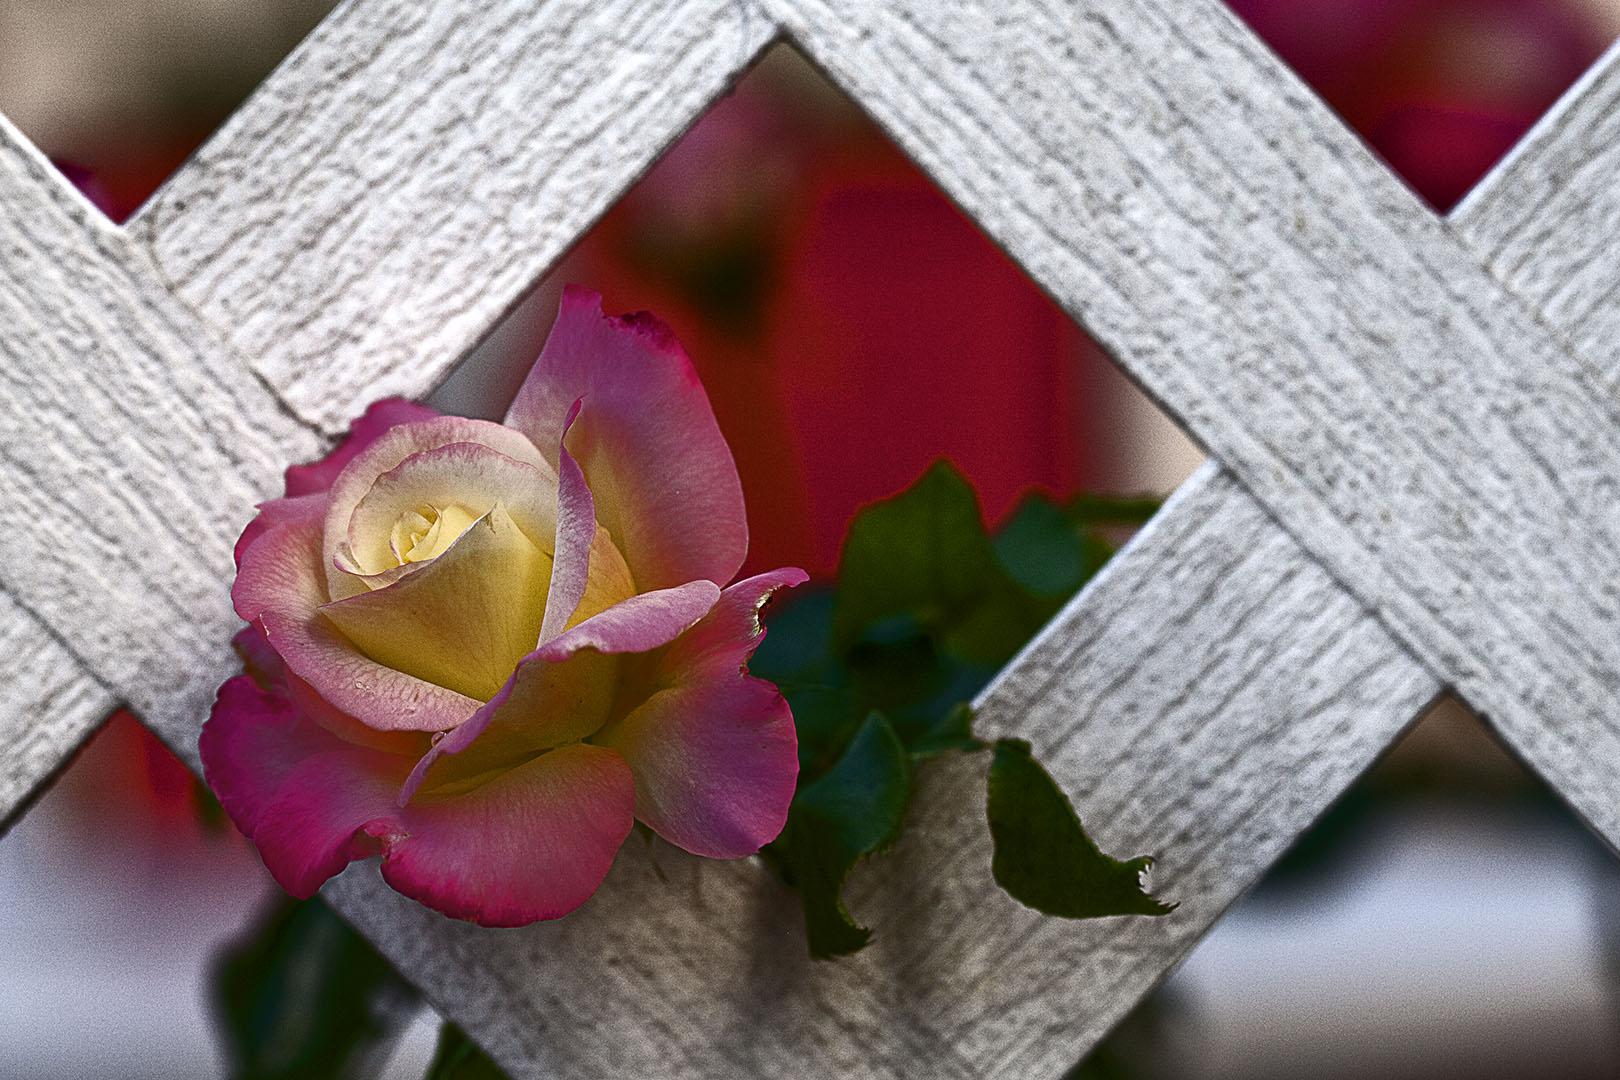 Ruby's Rose